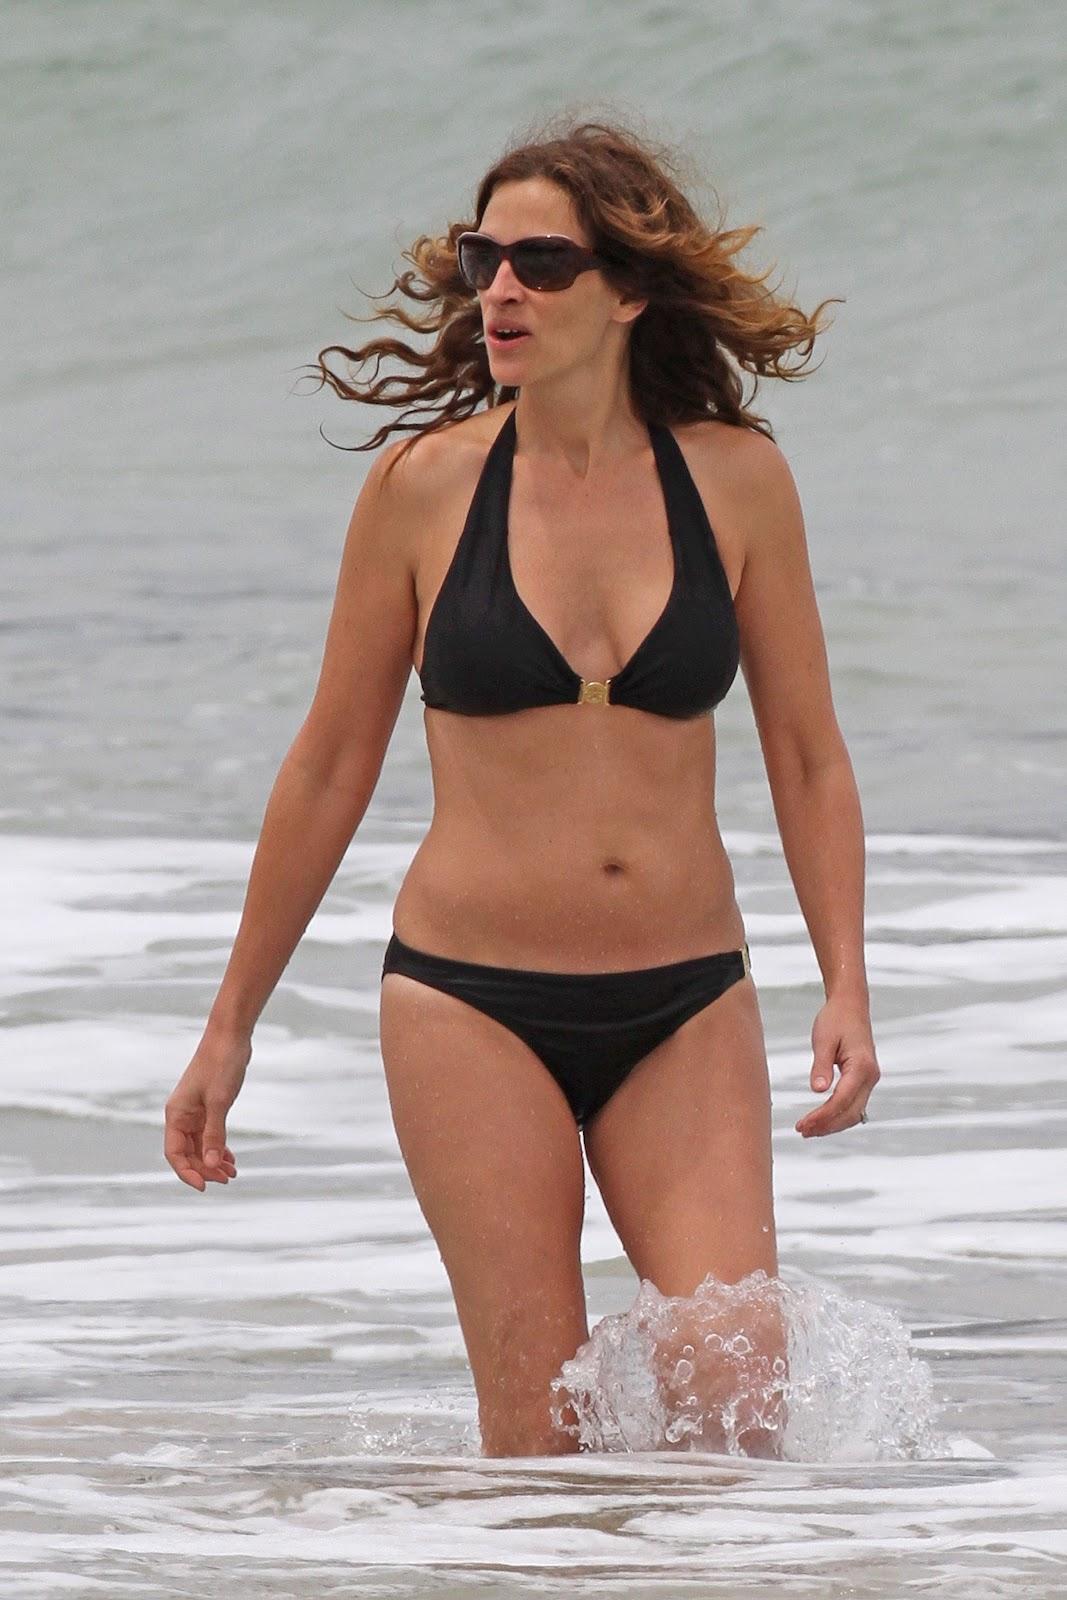 http://2.bp.blogspot.com/-tJ6lbaEfEXU/T8Ds94vRssI/AAAAAAAAHIY/o9AErchte7U/s1600/+Julia+Roberts+-+Bikini+candids+Hawaii+%252813%2529.jpg